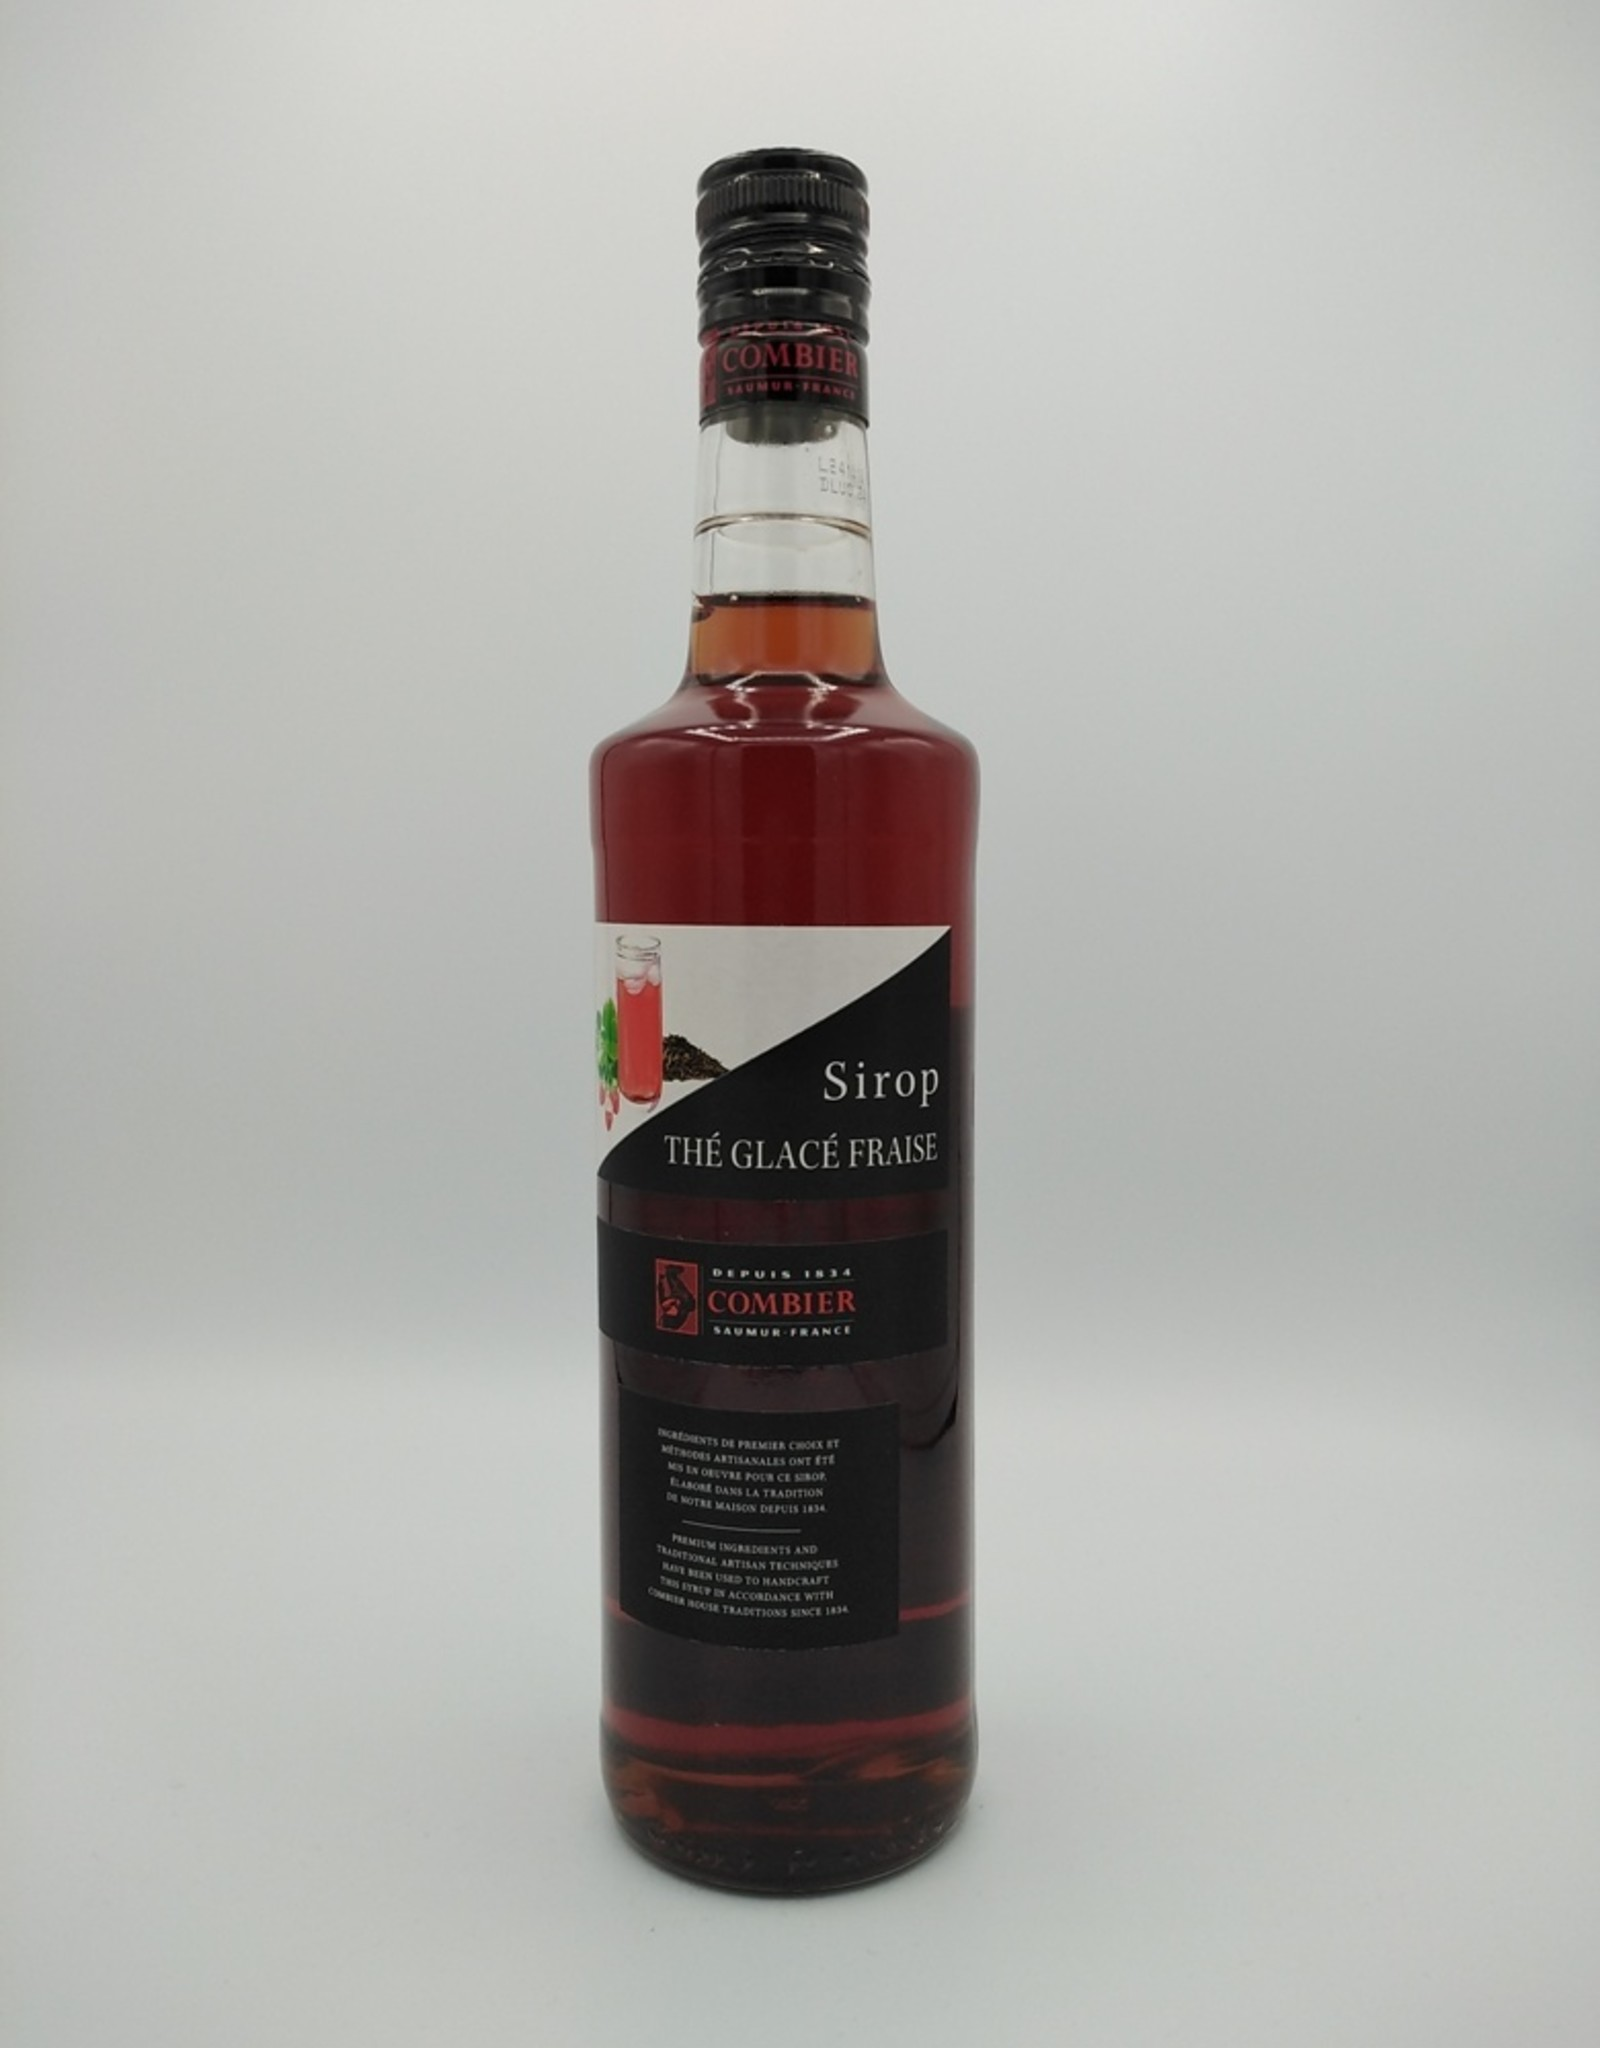 Distillerie Combier Distillerie Combier - Sirop Thé Glacé Fraise